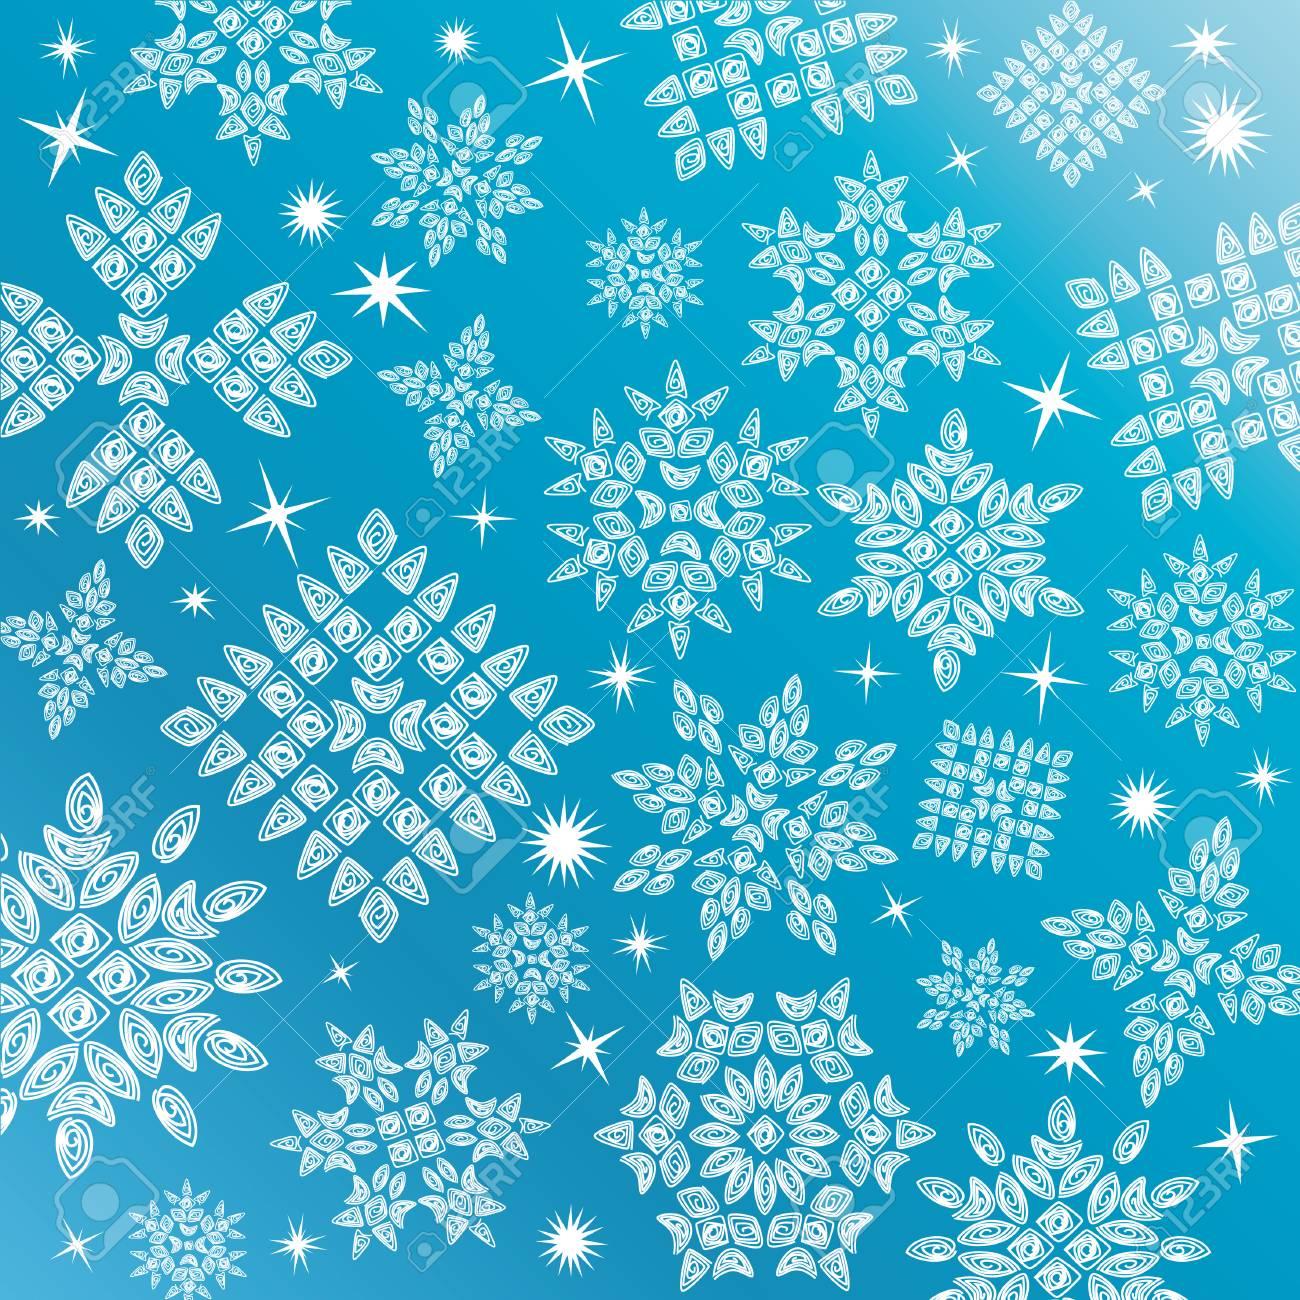 Vector Snowflakes Set Stock Vector - 8704339